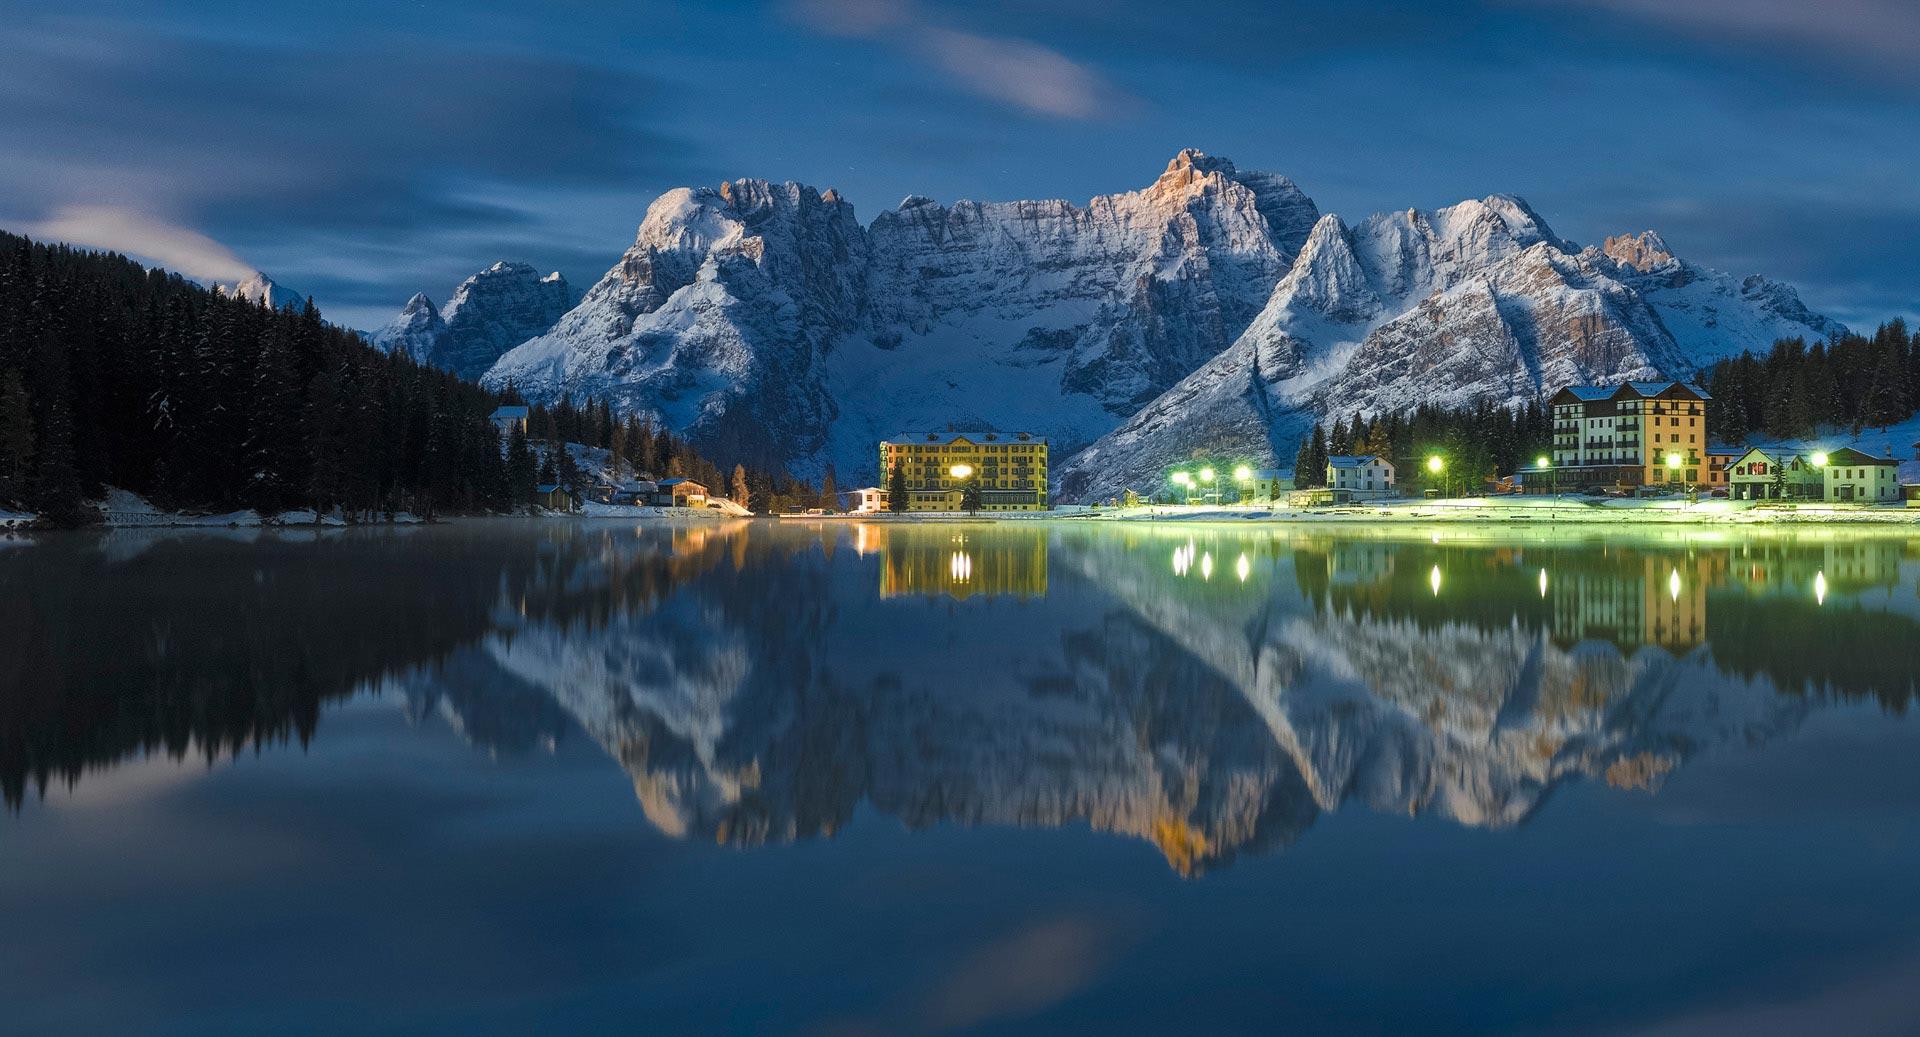 Misurina lake blue-misurina_©nicolabombassei